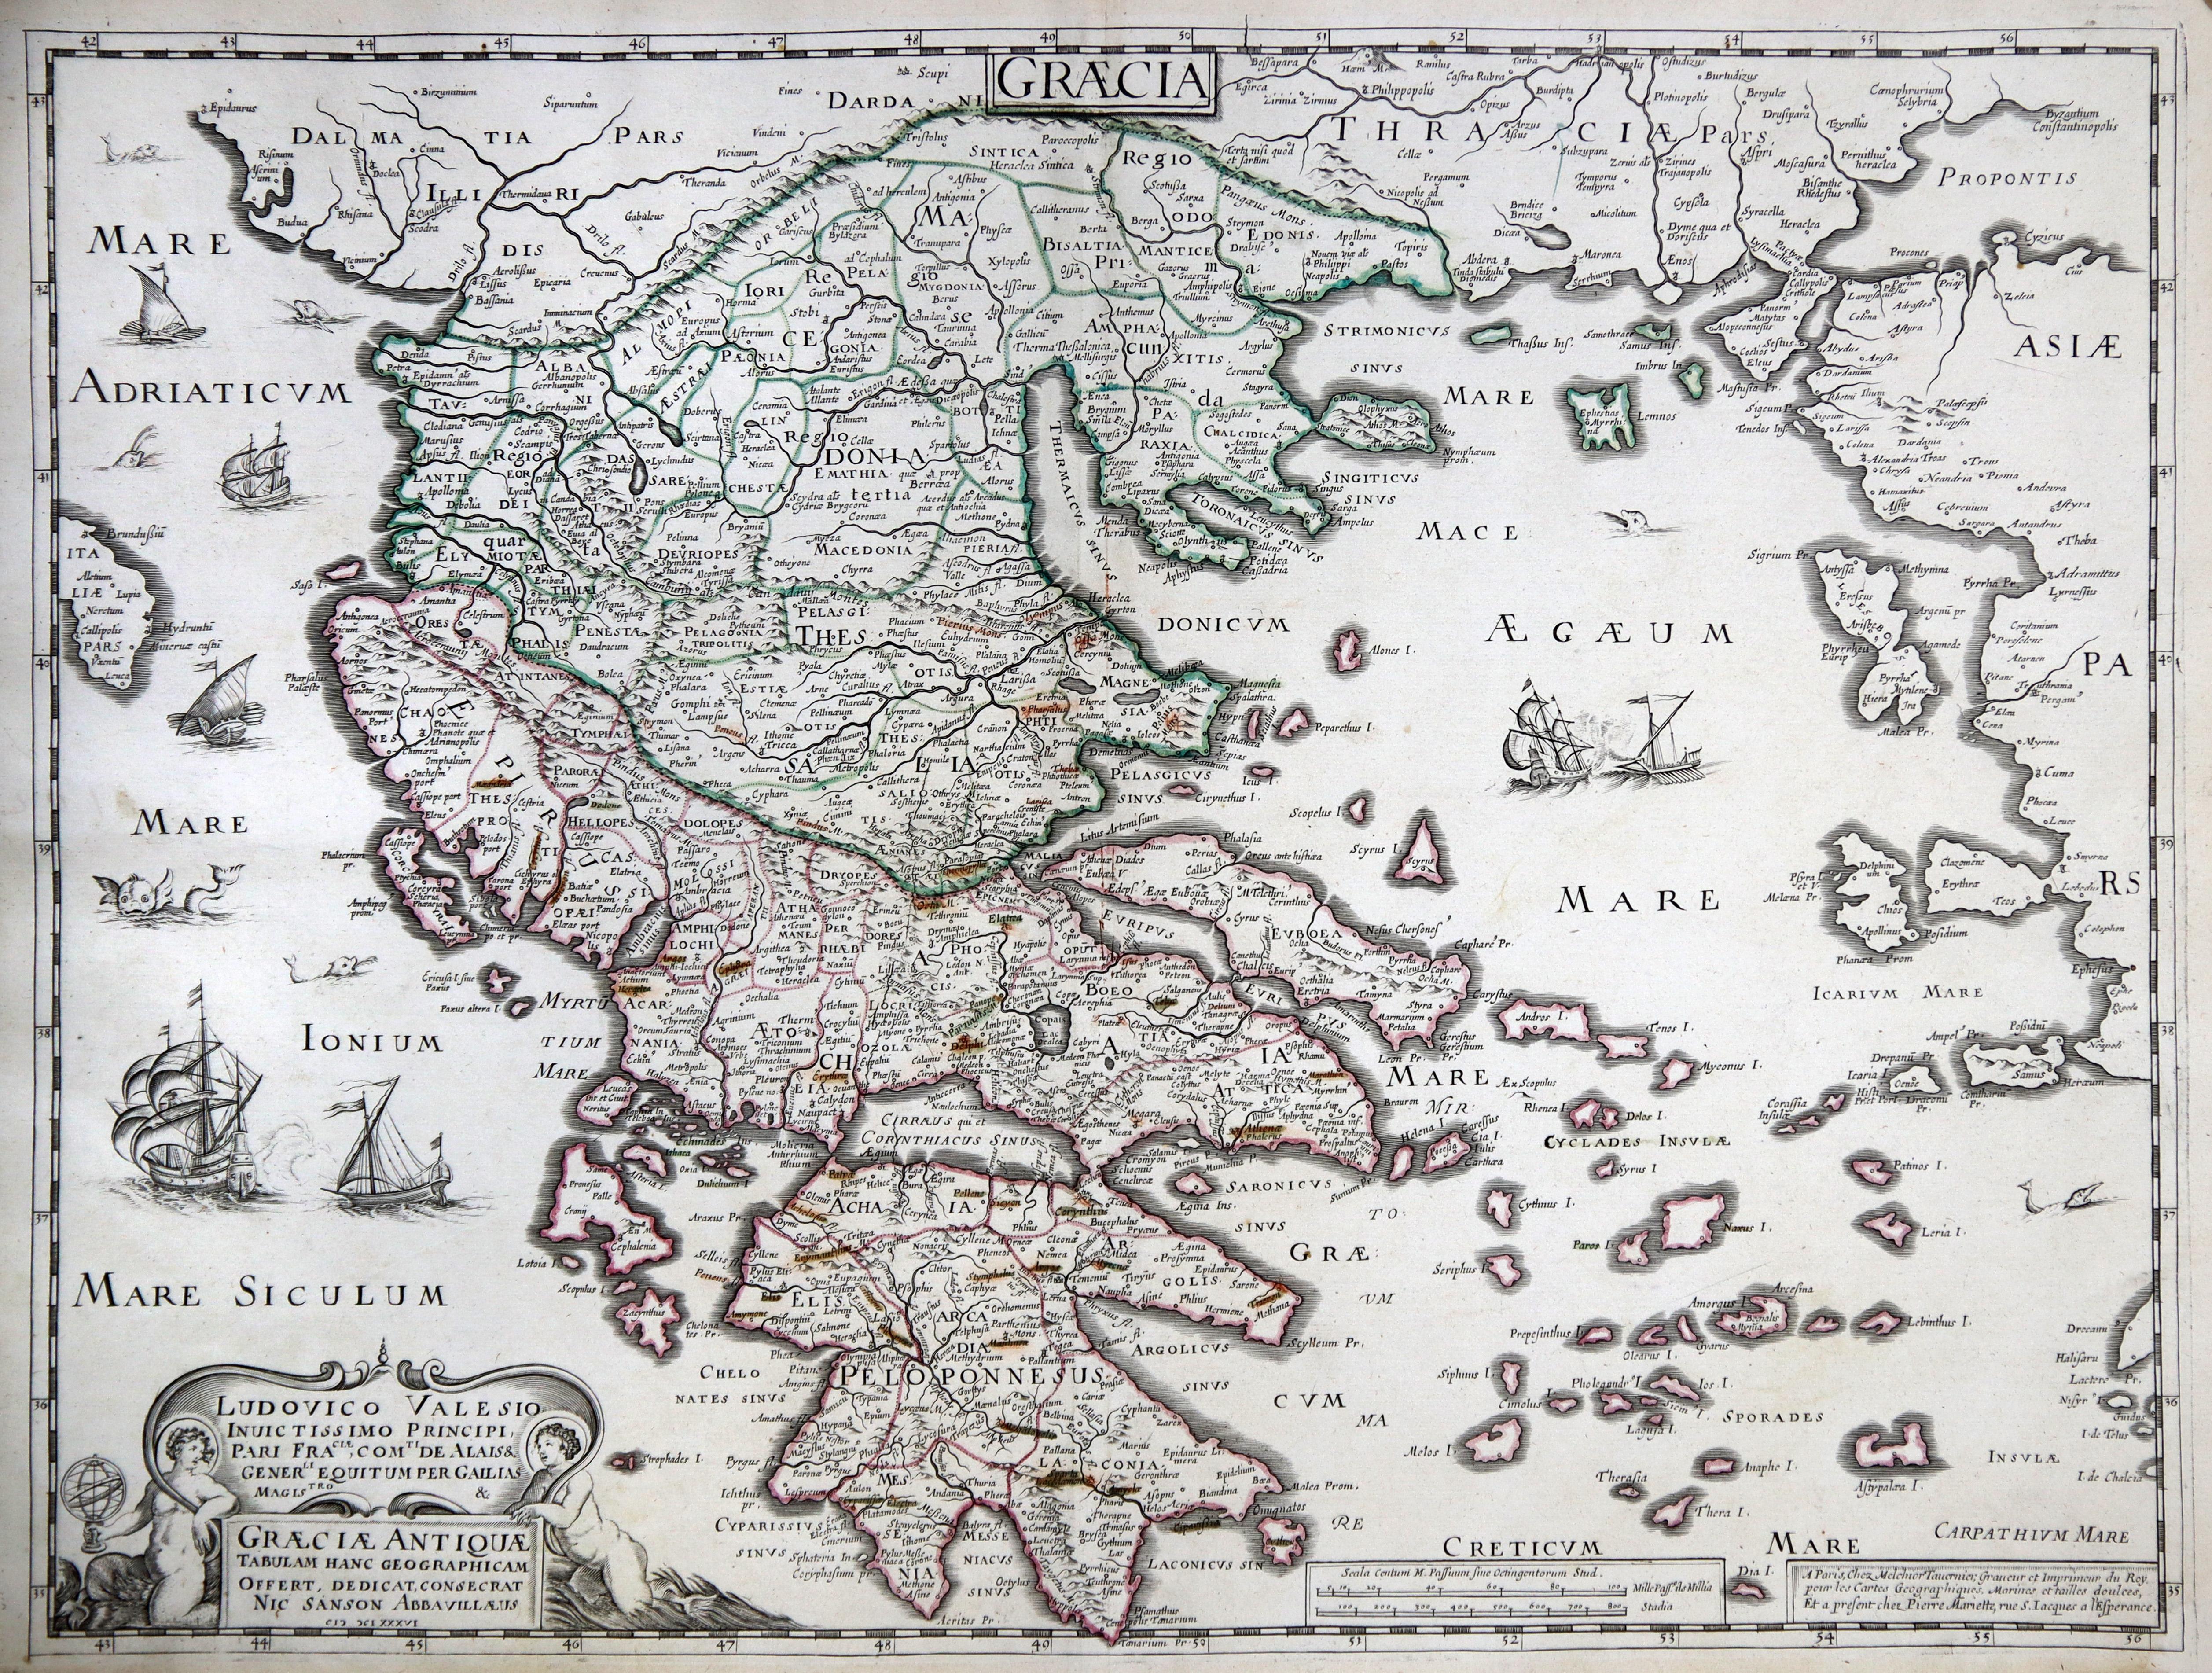 Kst.- Karte, n. Tavernier / N. Sanson: Griechenland ( Greece